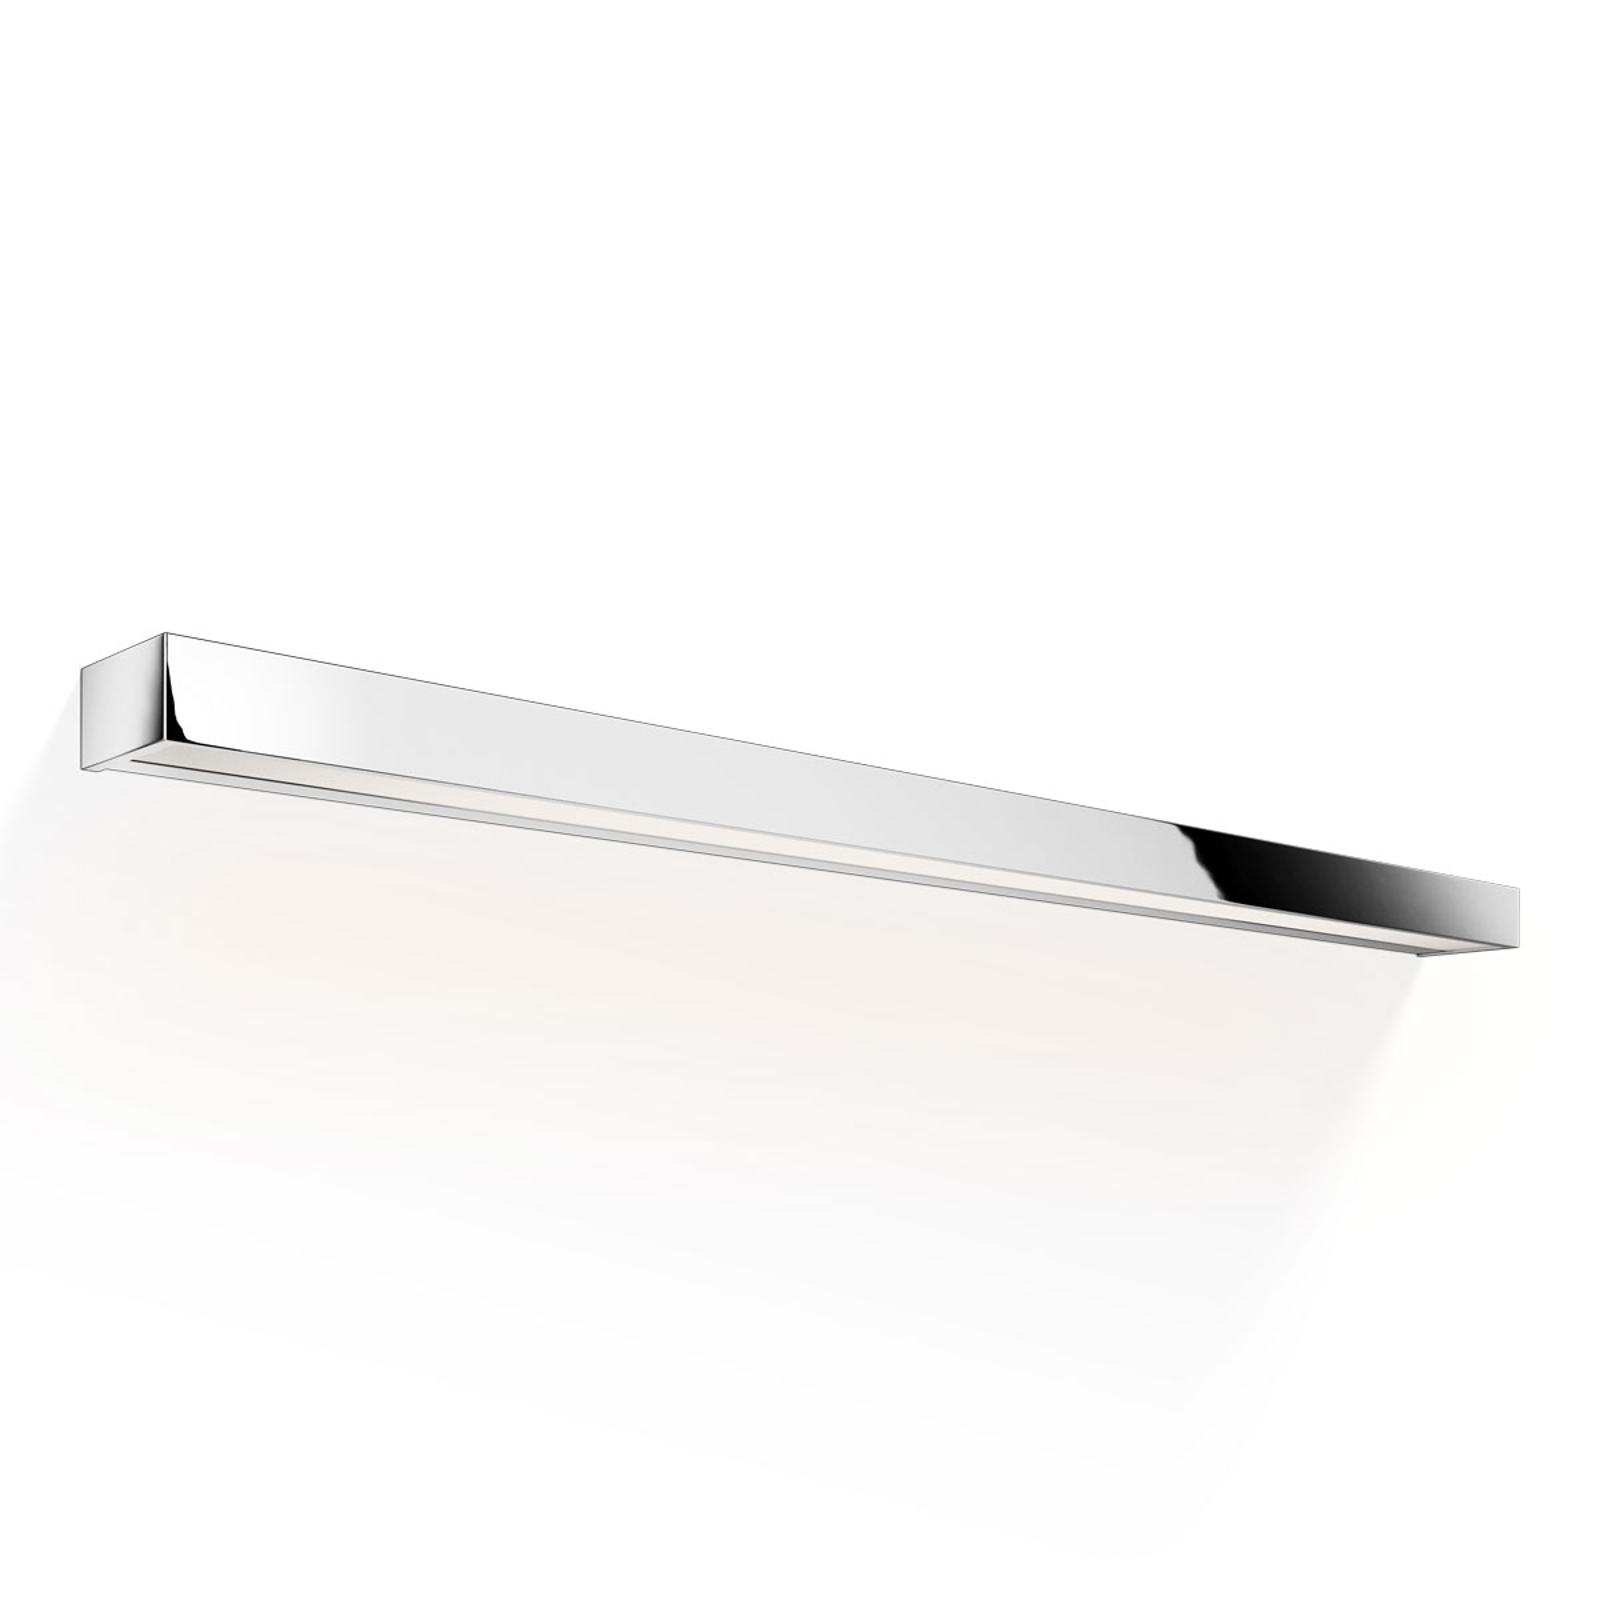 Decor Walther Box 120 N LED wandlamp 2.700 K